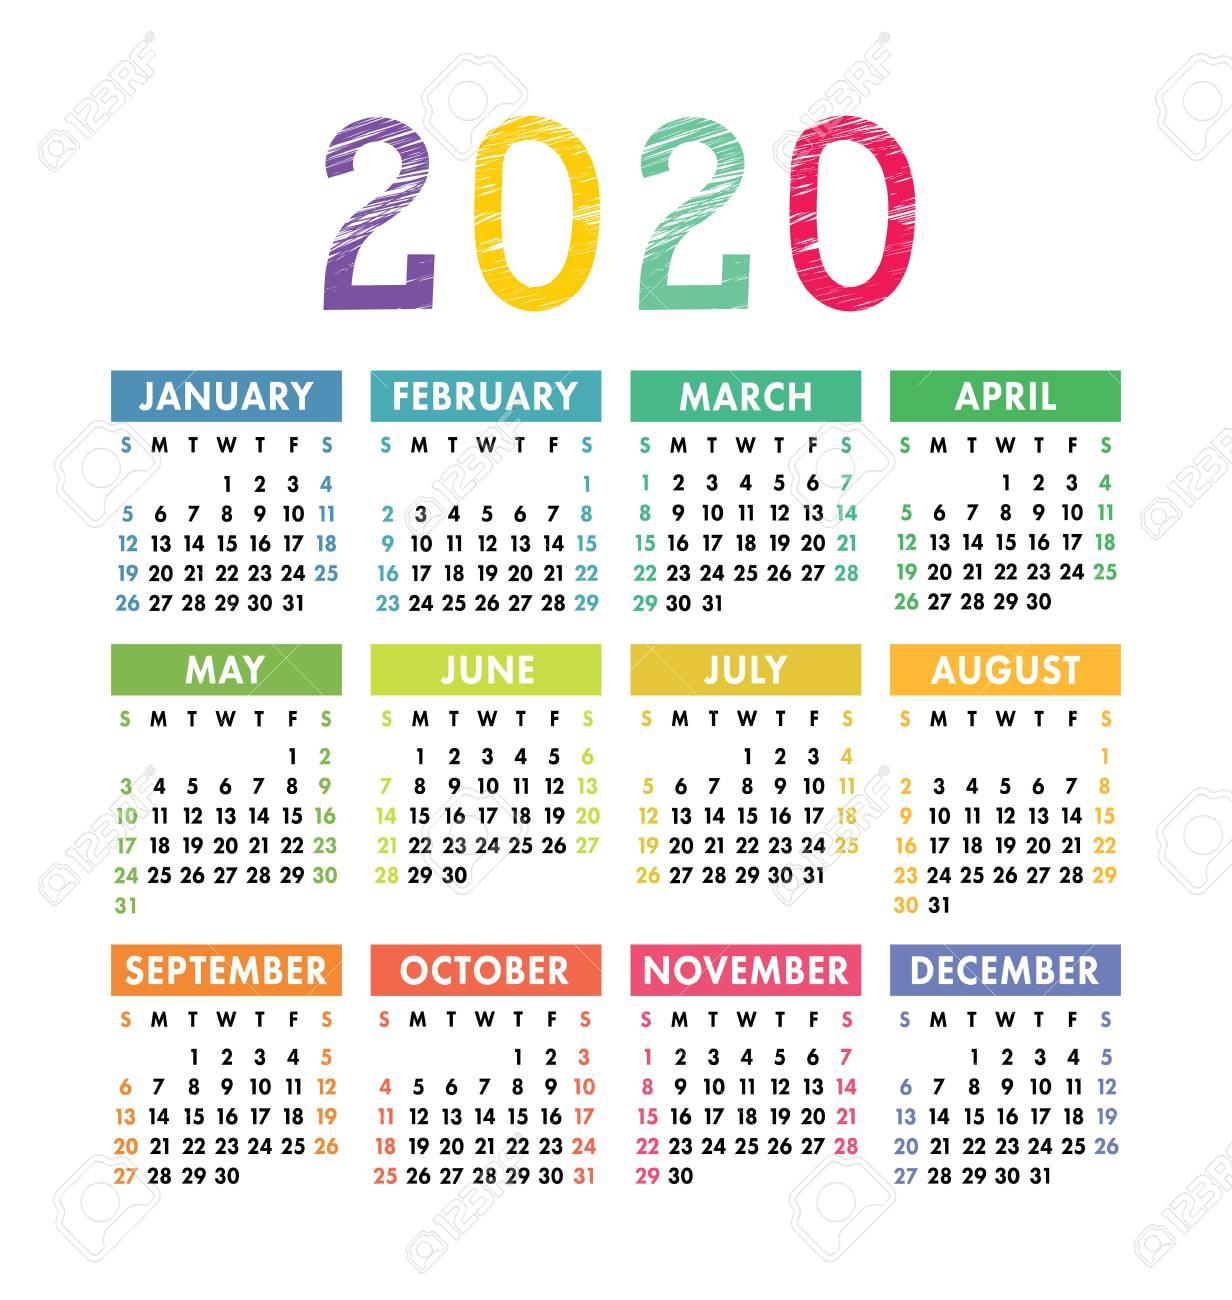 Get Form W 9 2020 Printable Pdf